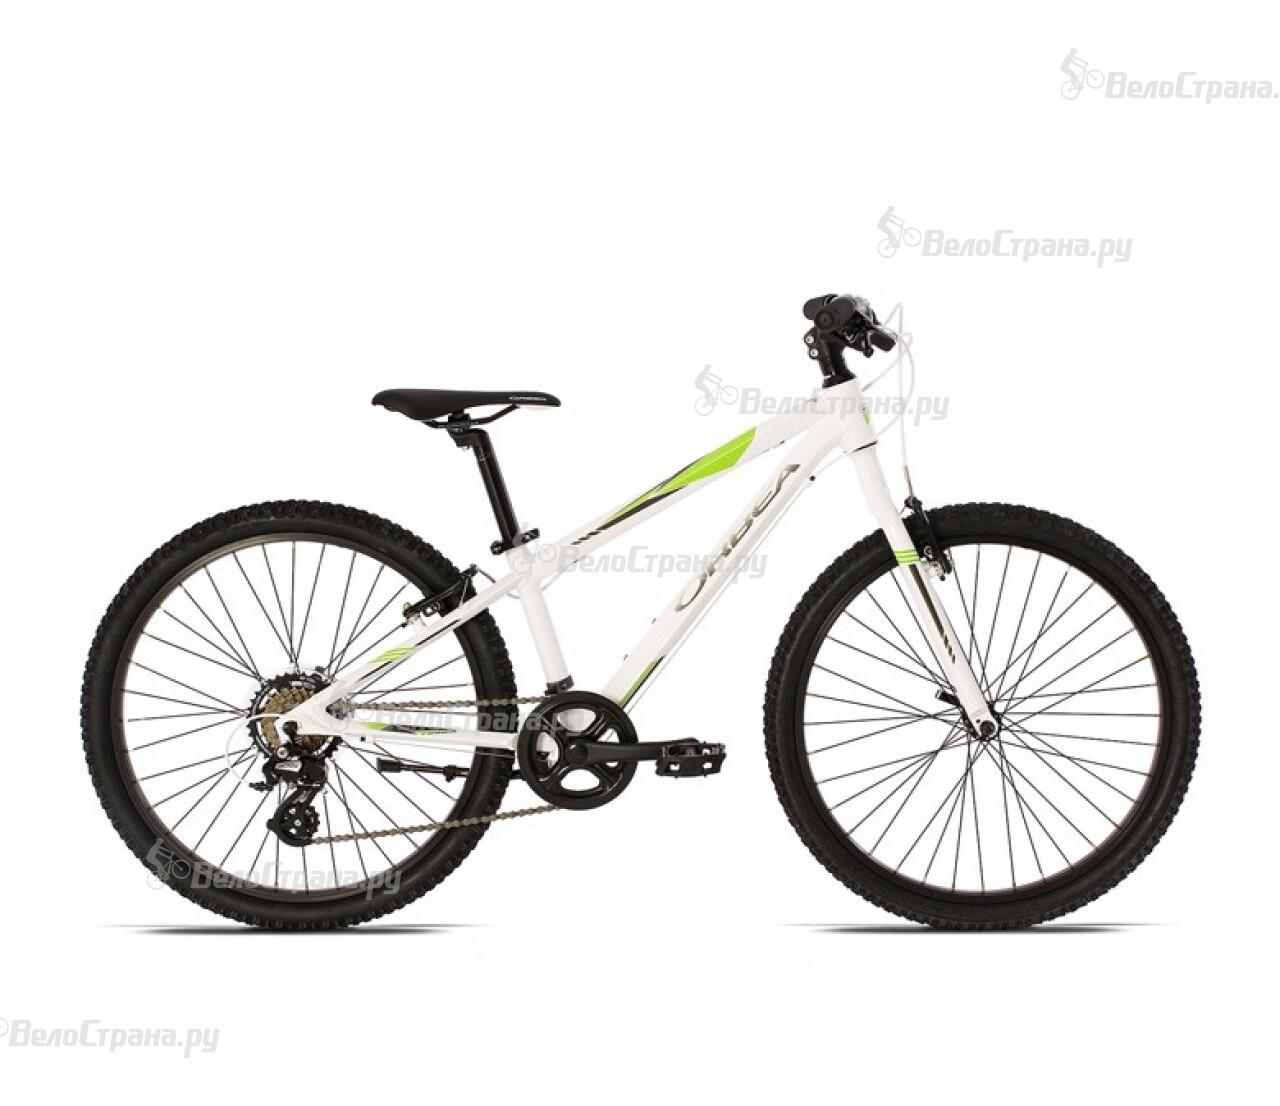 все цены на Велосипед Orbea Mx 24 Dirt (2013) онлайн